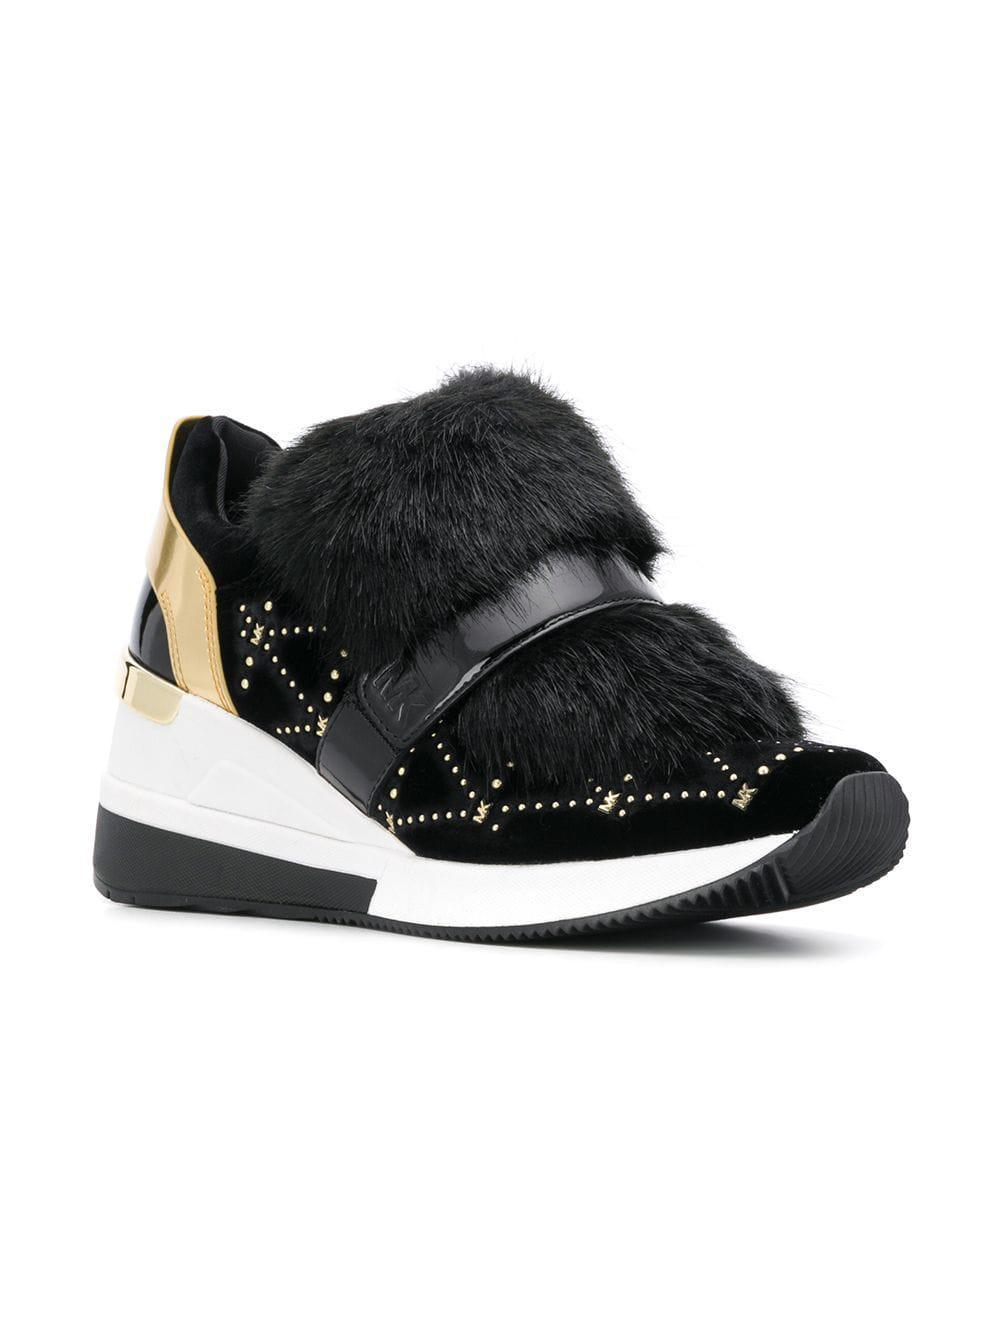 e91c5da0ede60 Lyst - MICHAEL Michael Kors High Maven Sneakers in Black - Save 42%